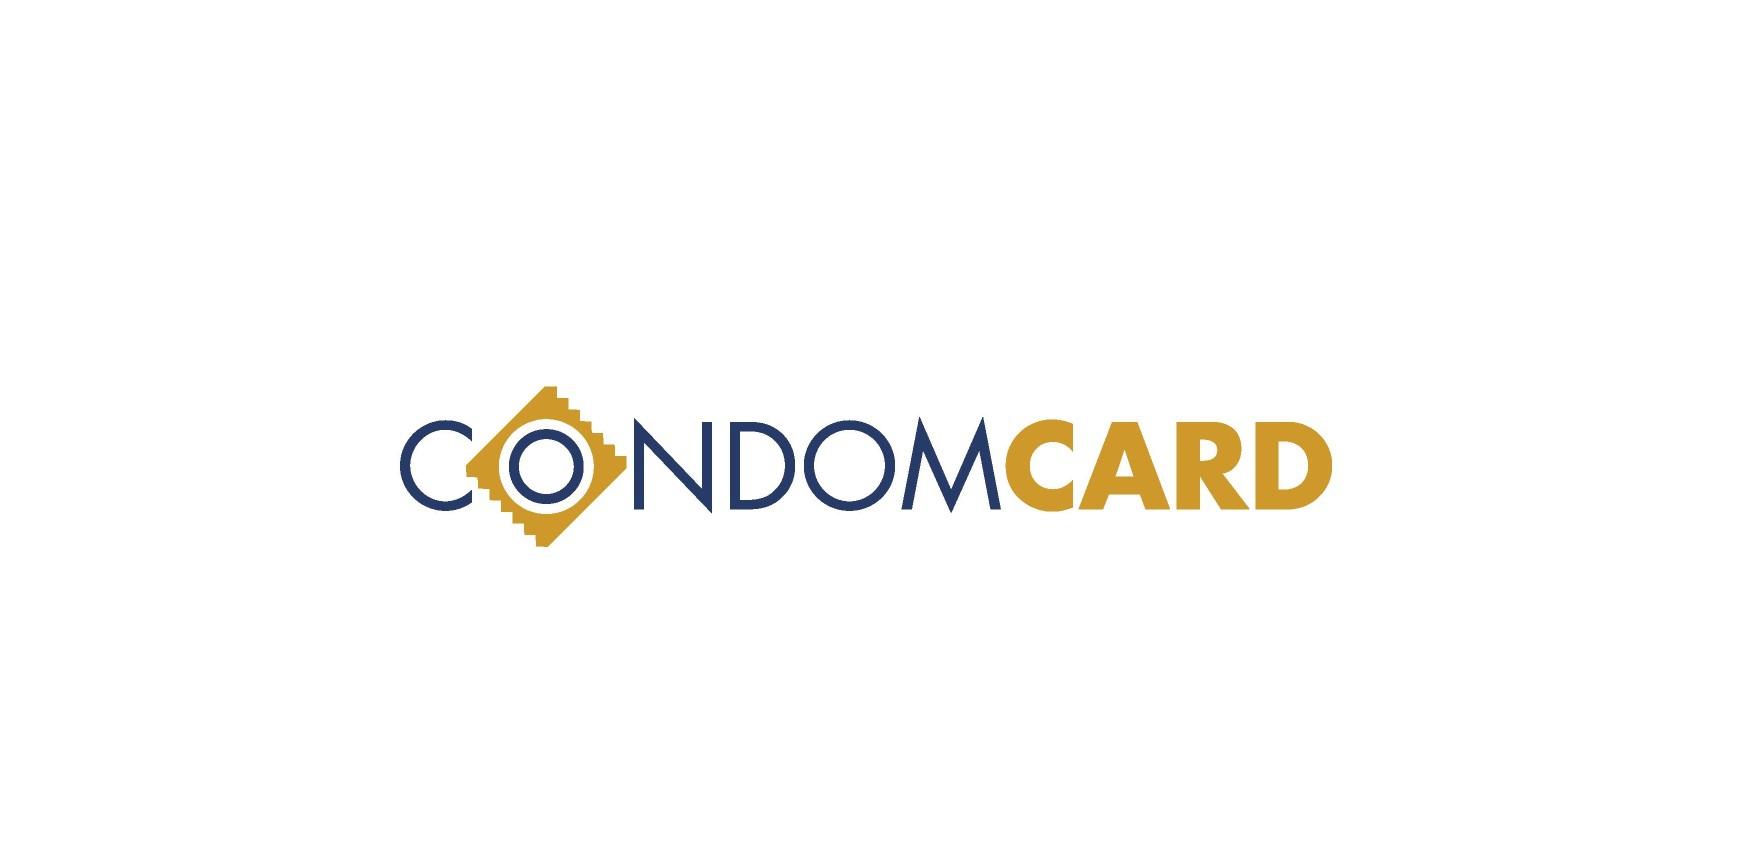 CONDOMCARD